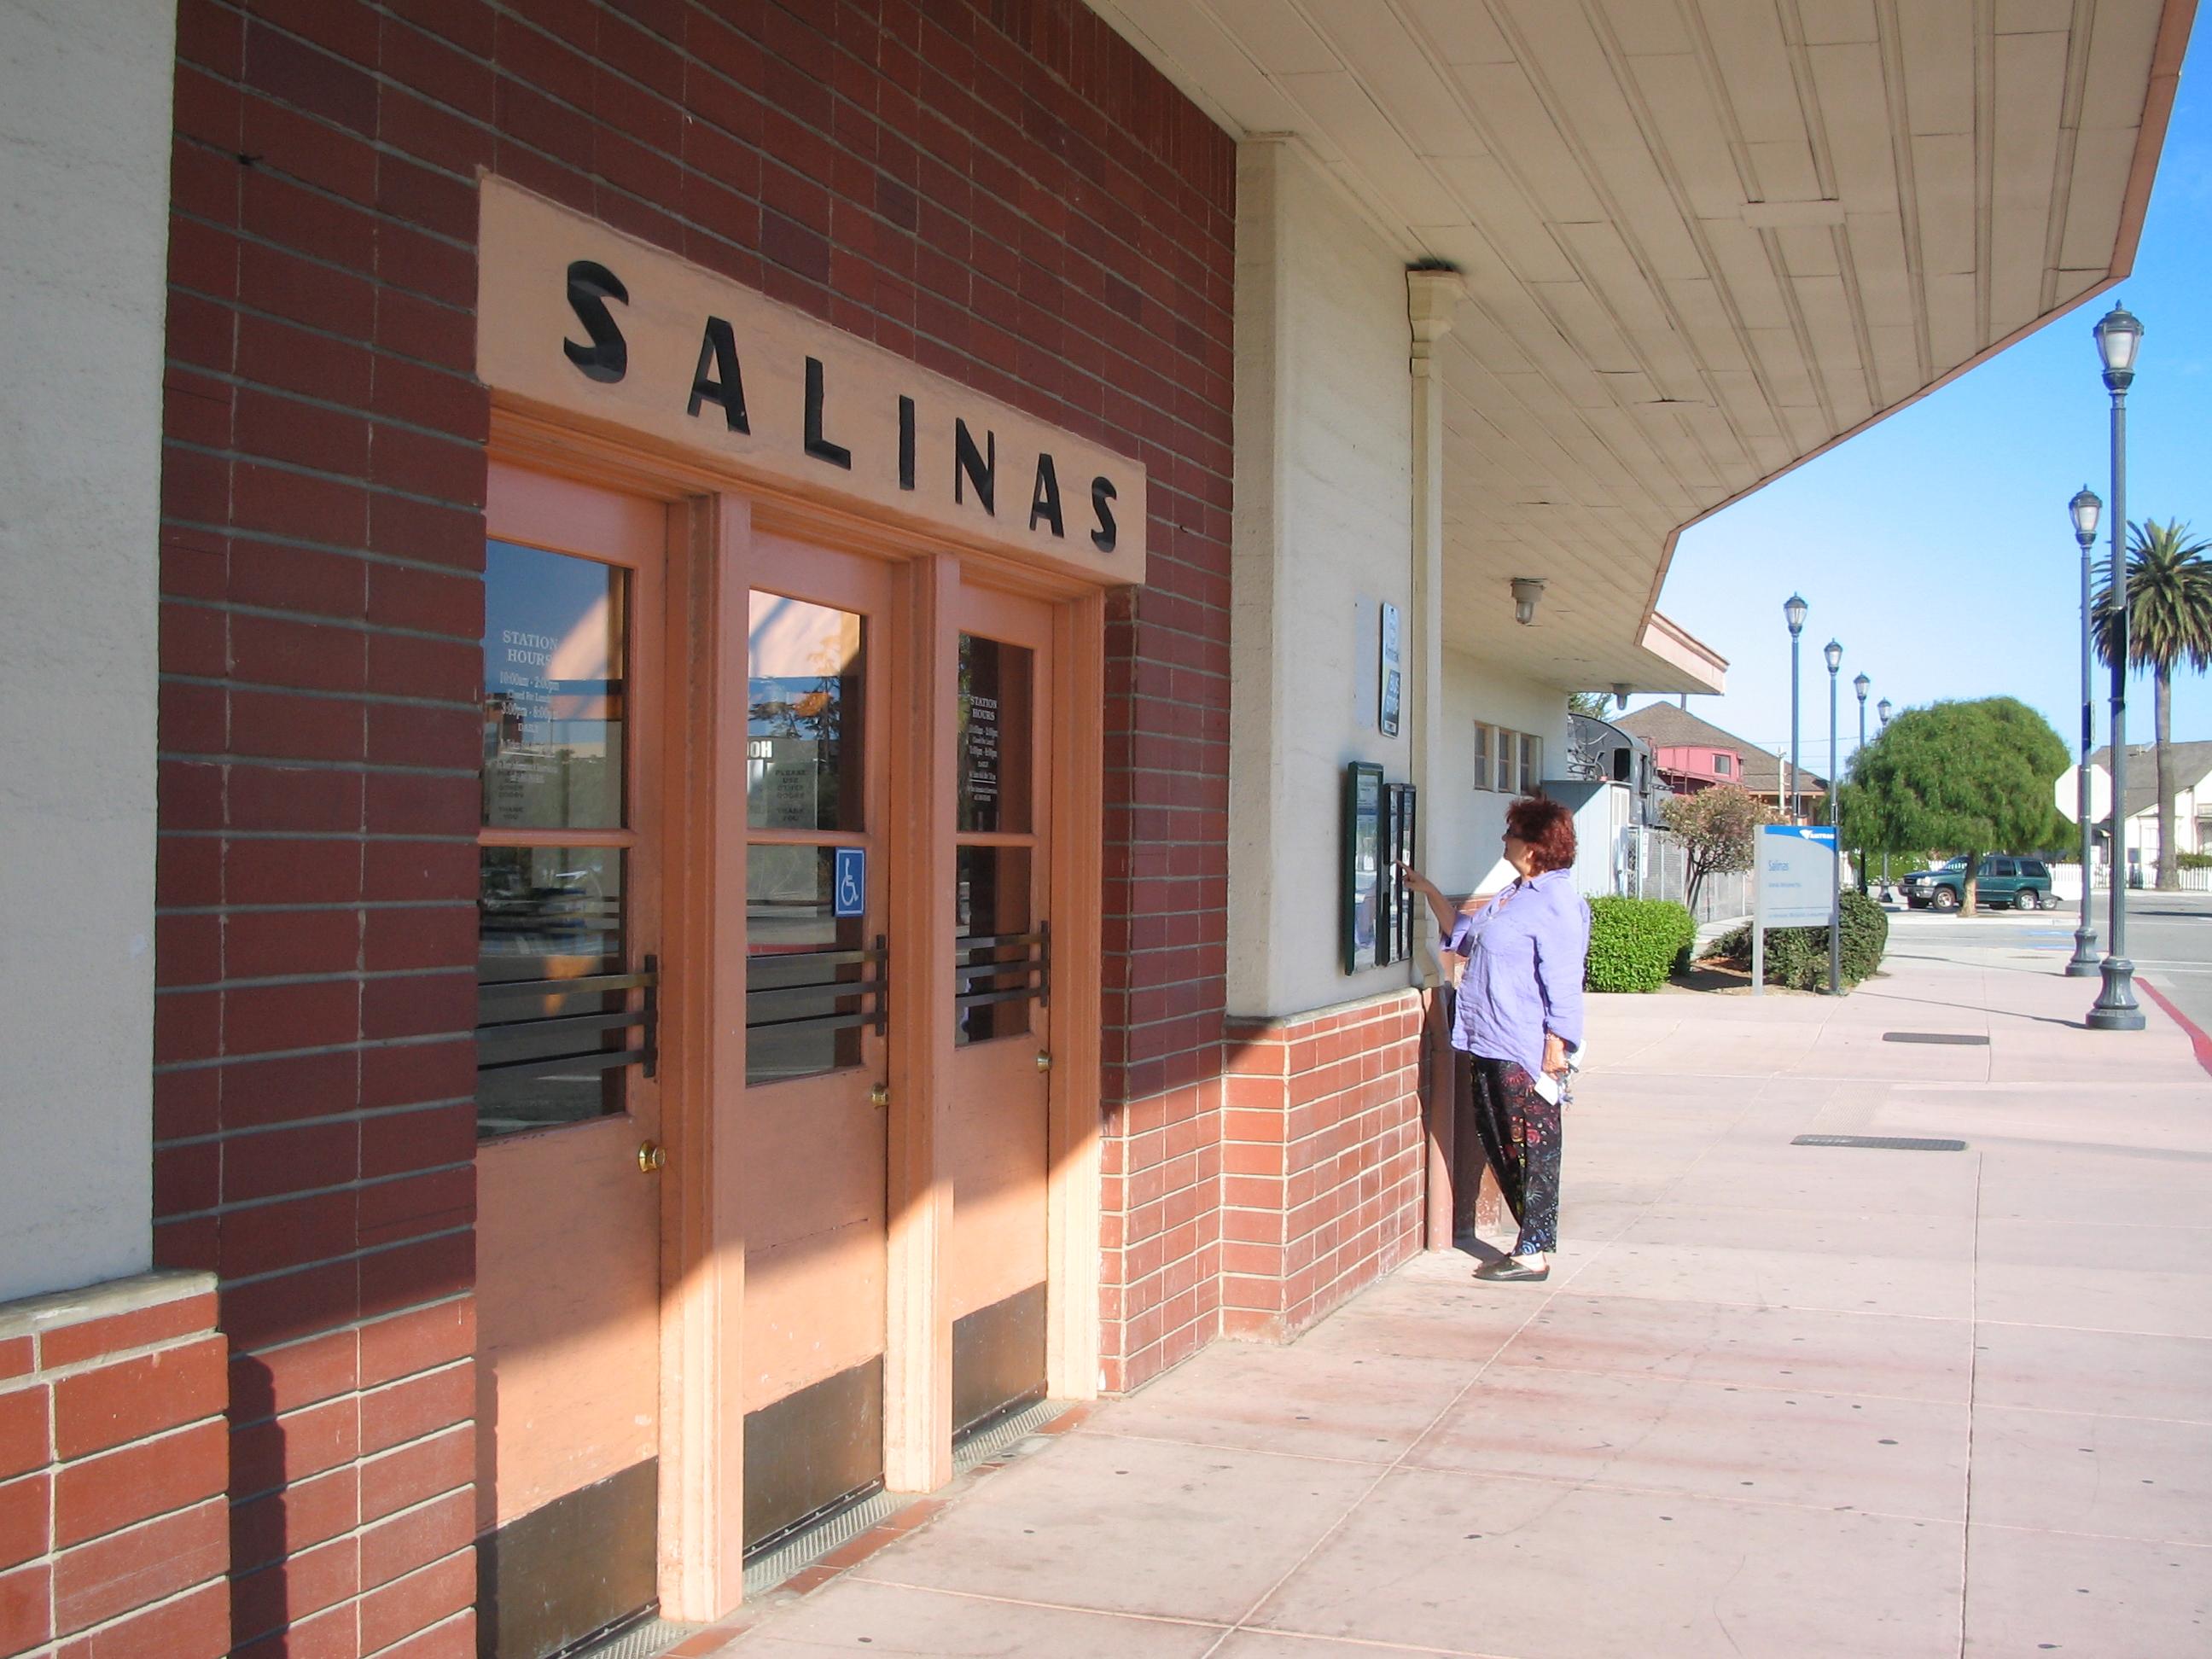 Art Deco Style Amtrak Train Station in Salinas.